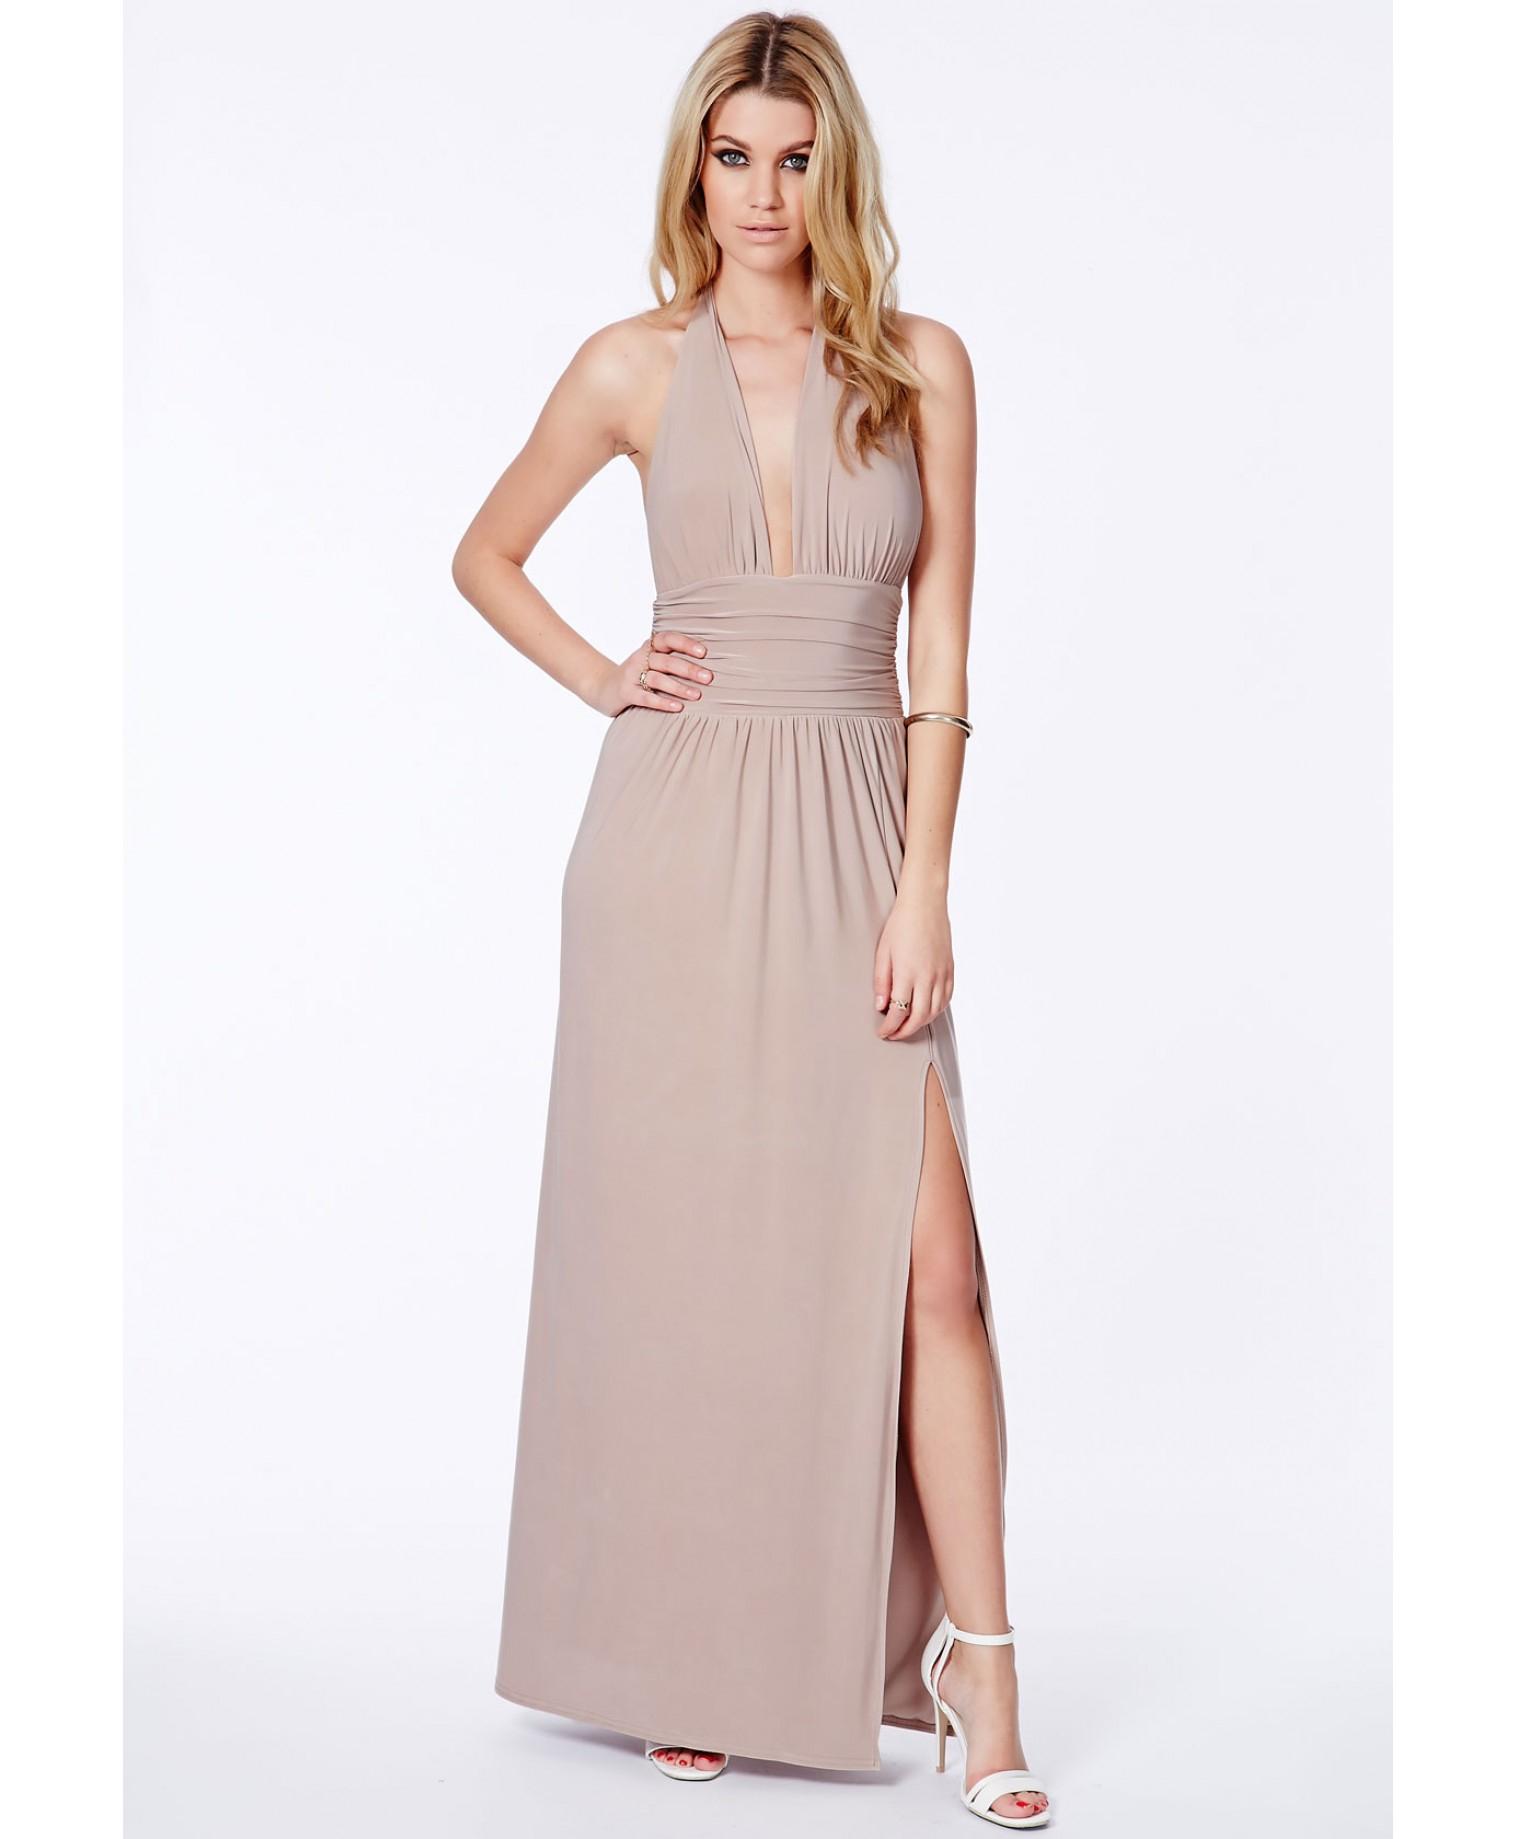 Taupe maxi dress